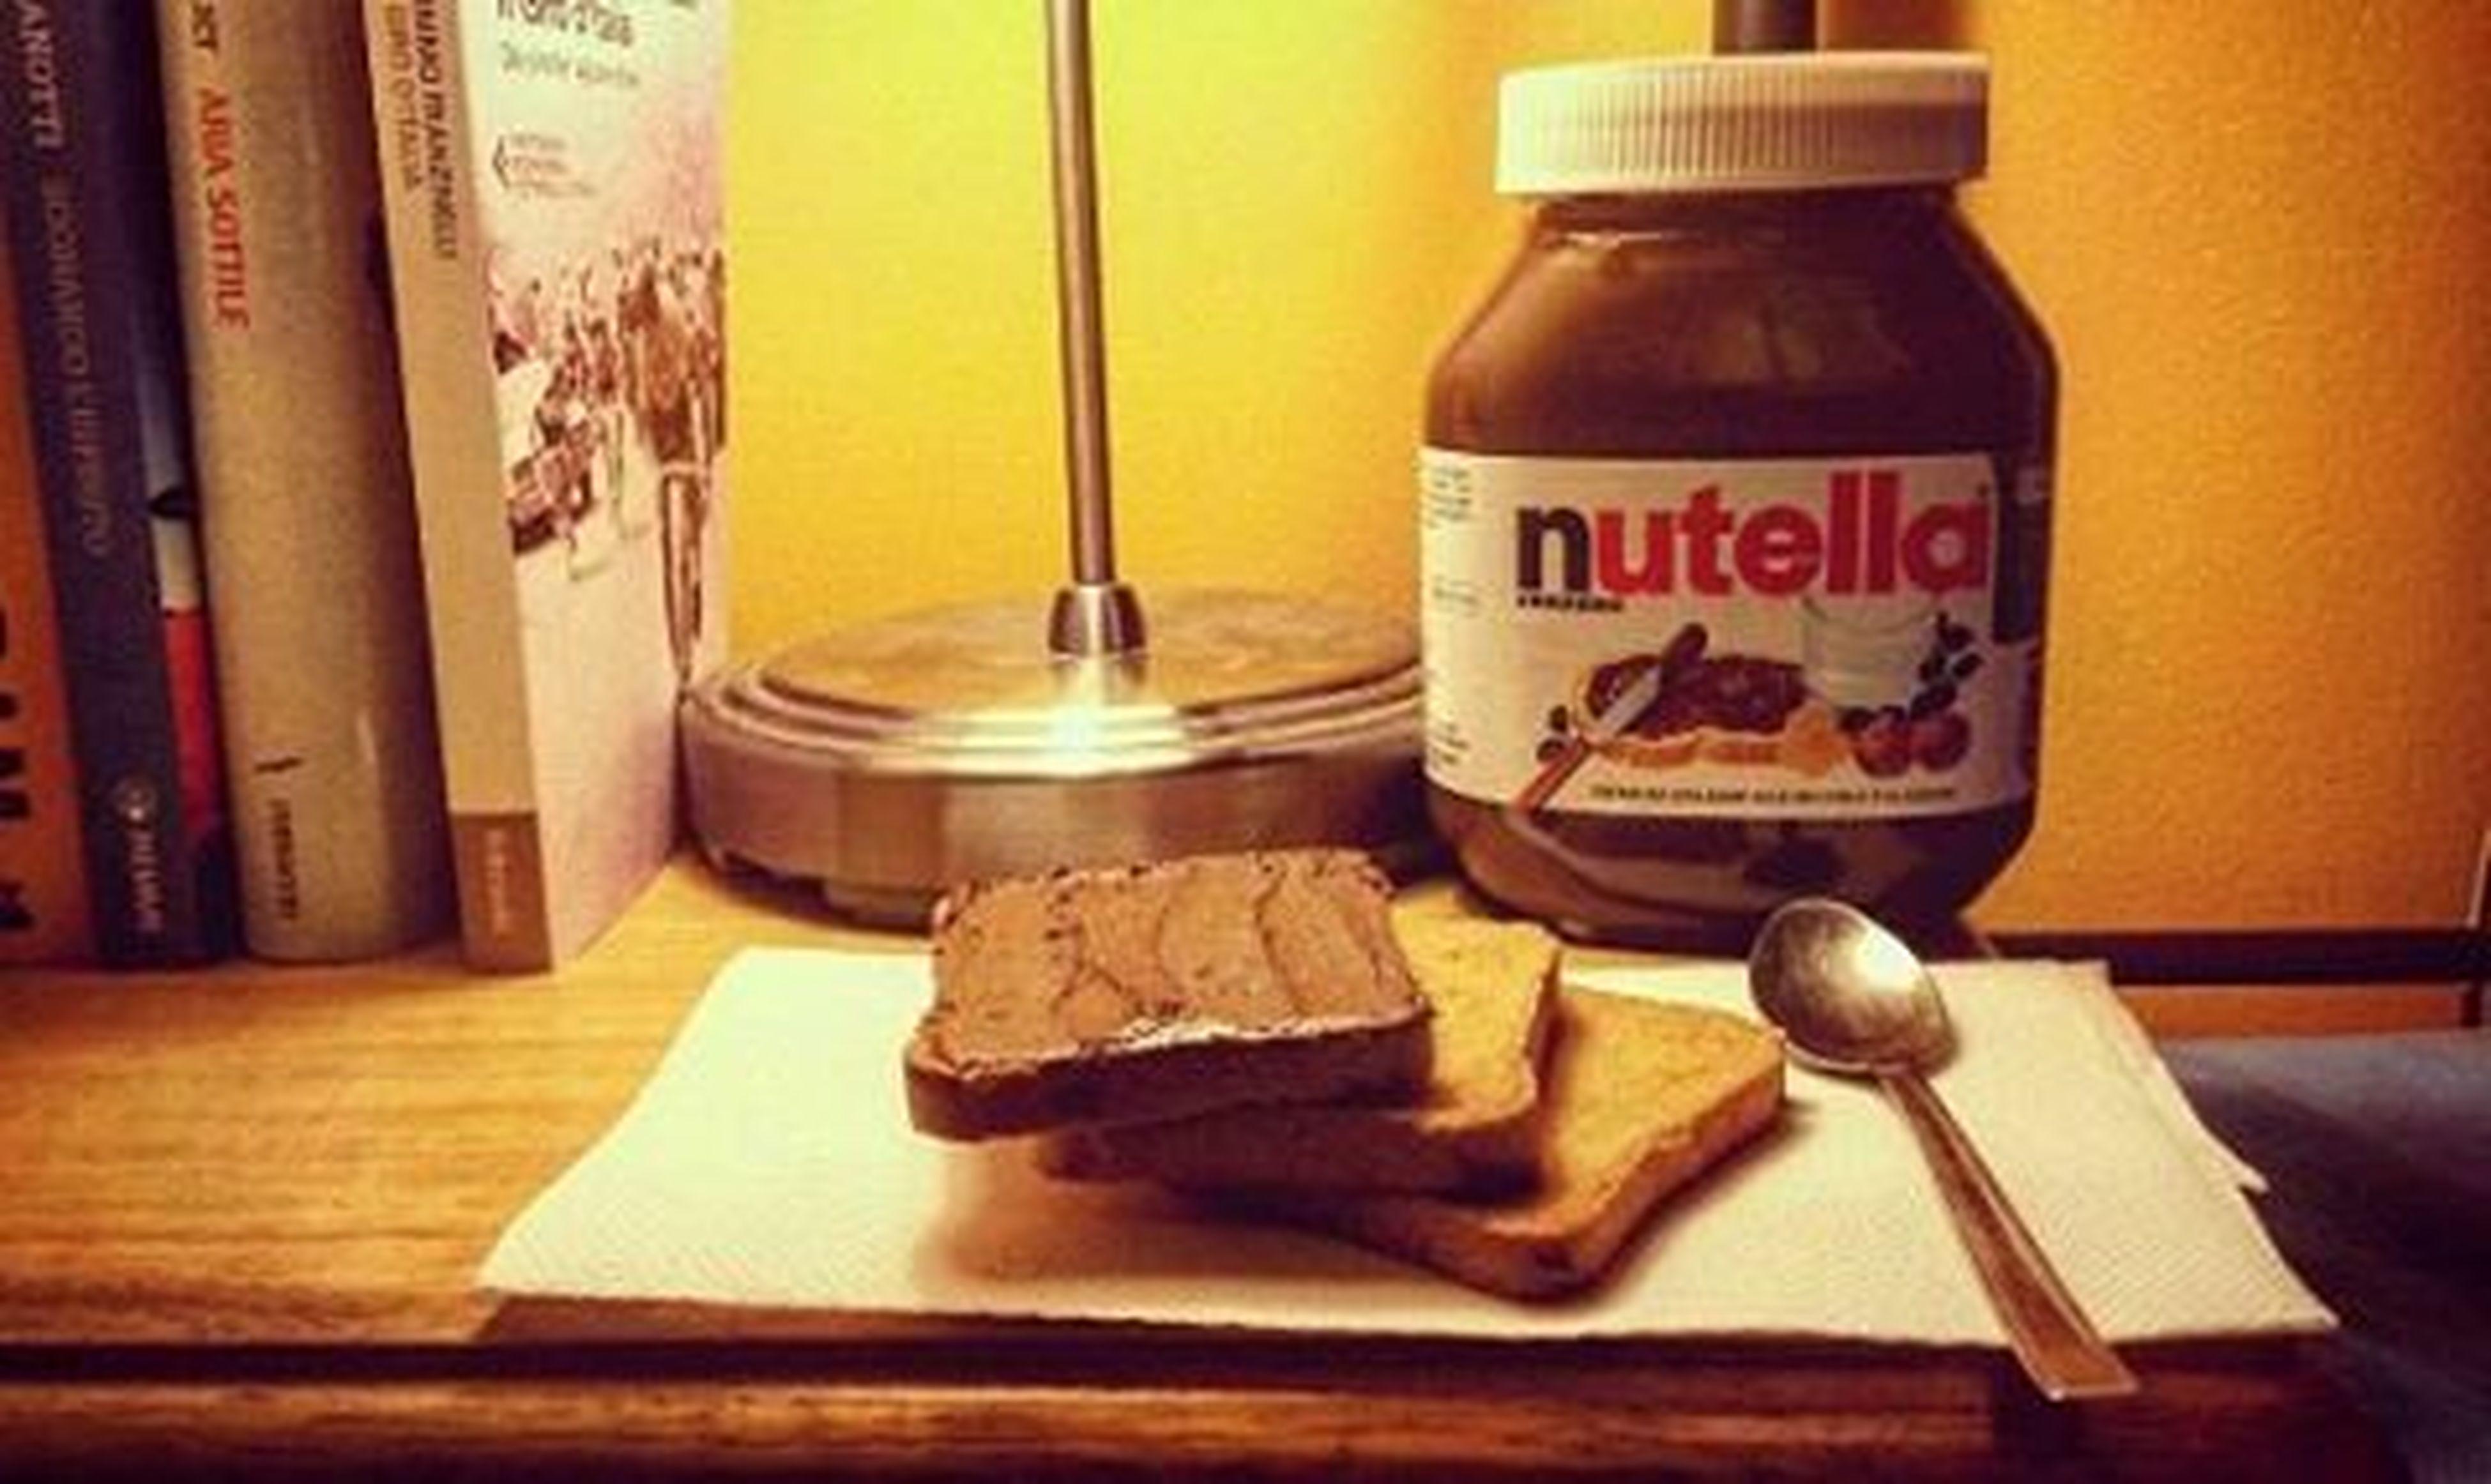 Nutella time ❤ Nutella Love Nutellalove Pensieri Domenica Vogliamocibene Loradelthe Coccoliamoci Nutelladipendente Instagood Instalike Photo Picoftheday Food Mangiachetipassa